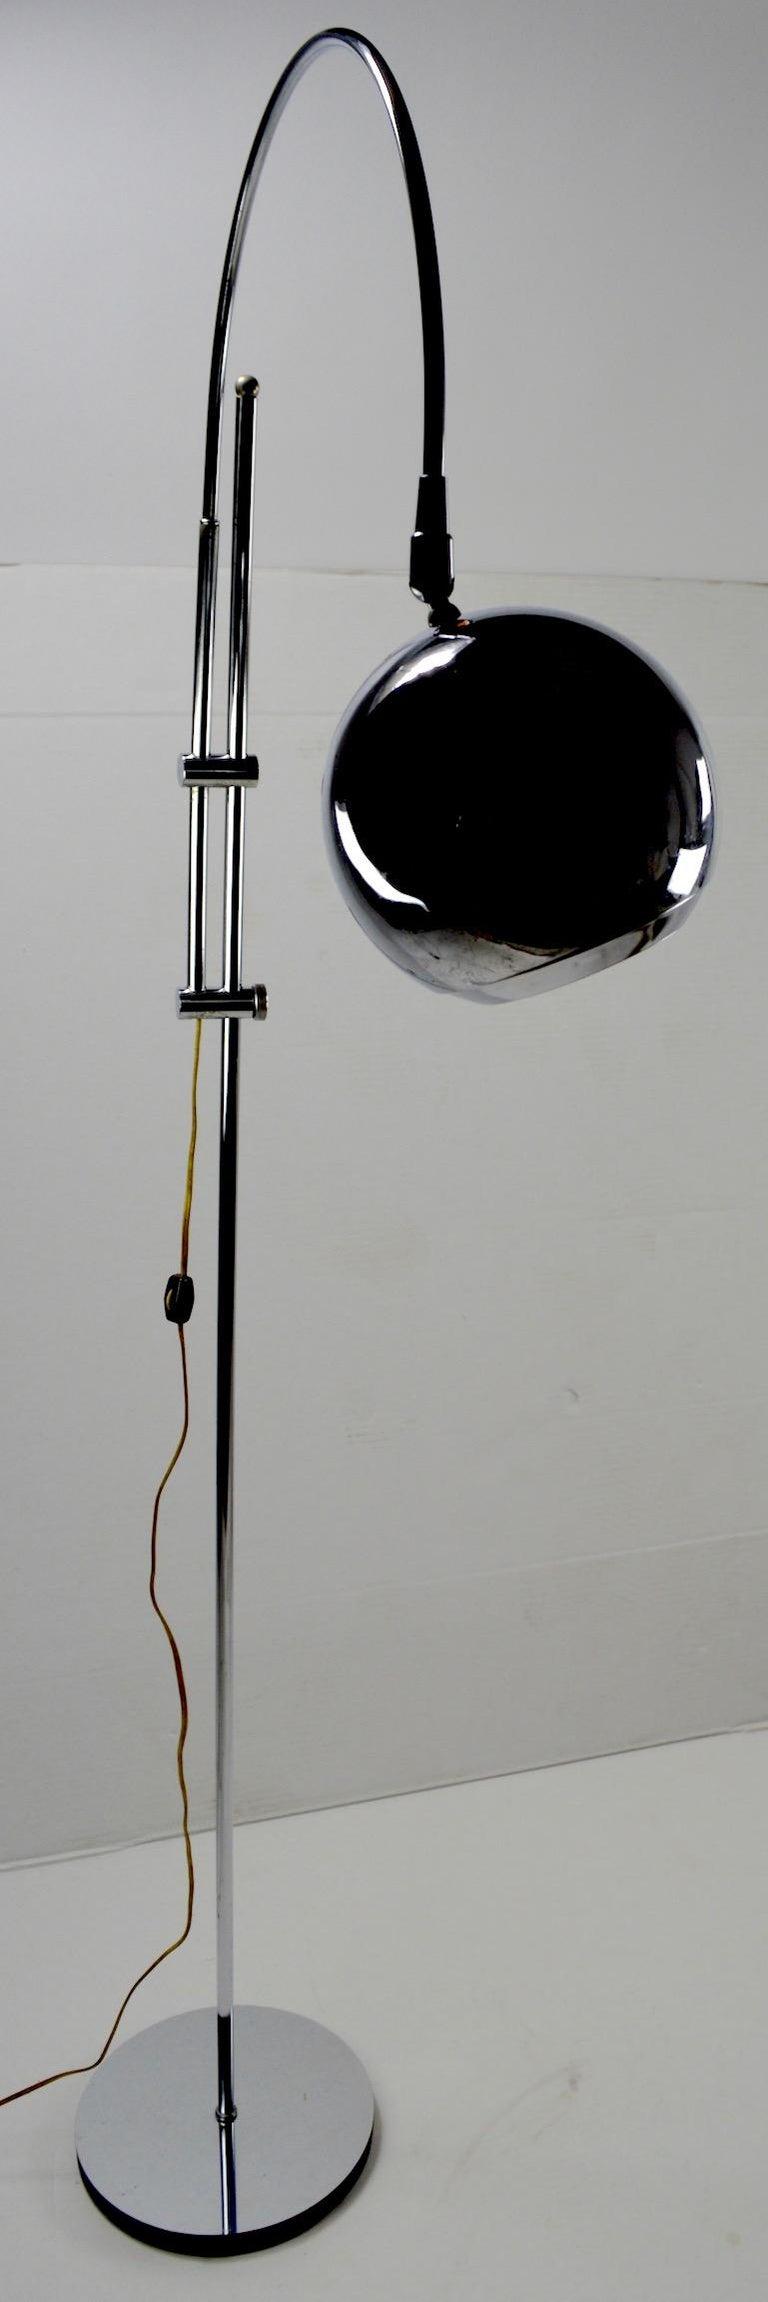 Adjustable Chrome Arc Lamp with Eyeball Shade For Sale 1